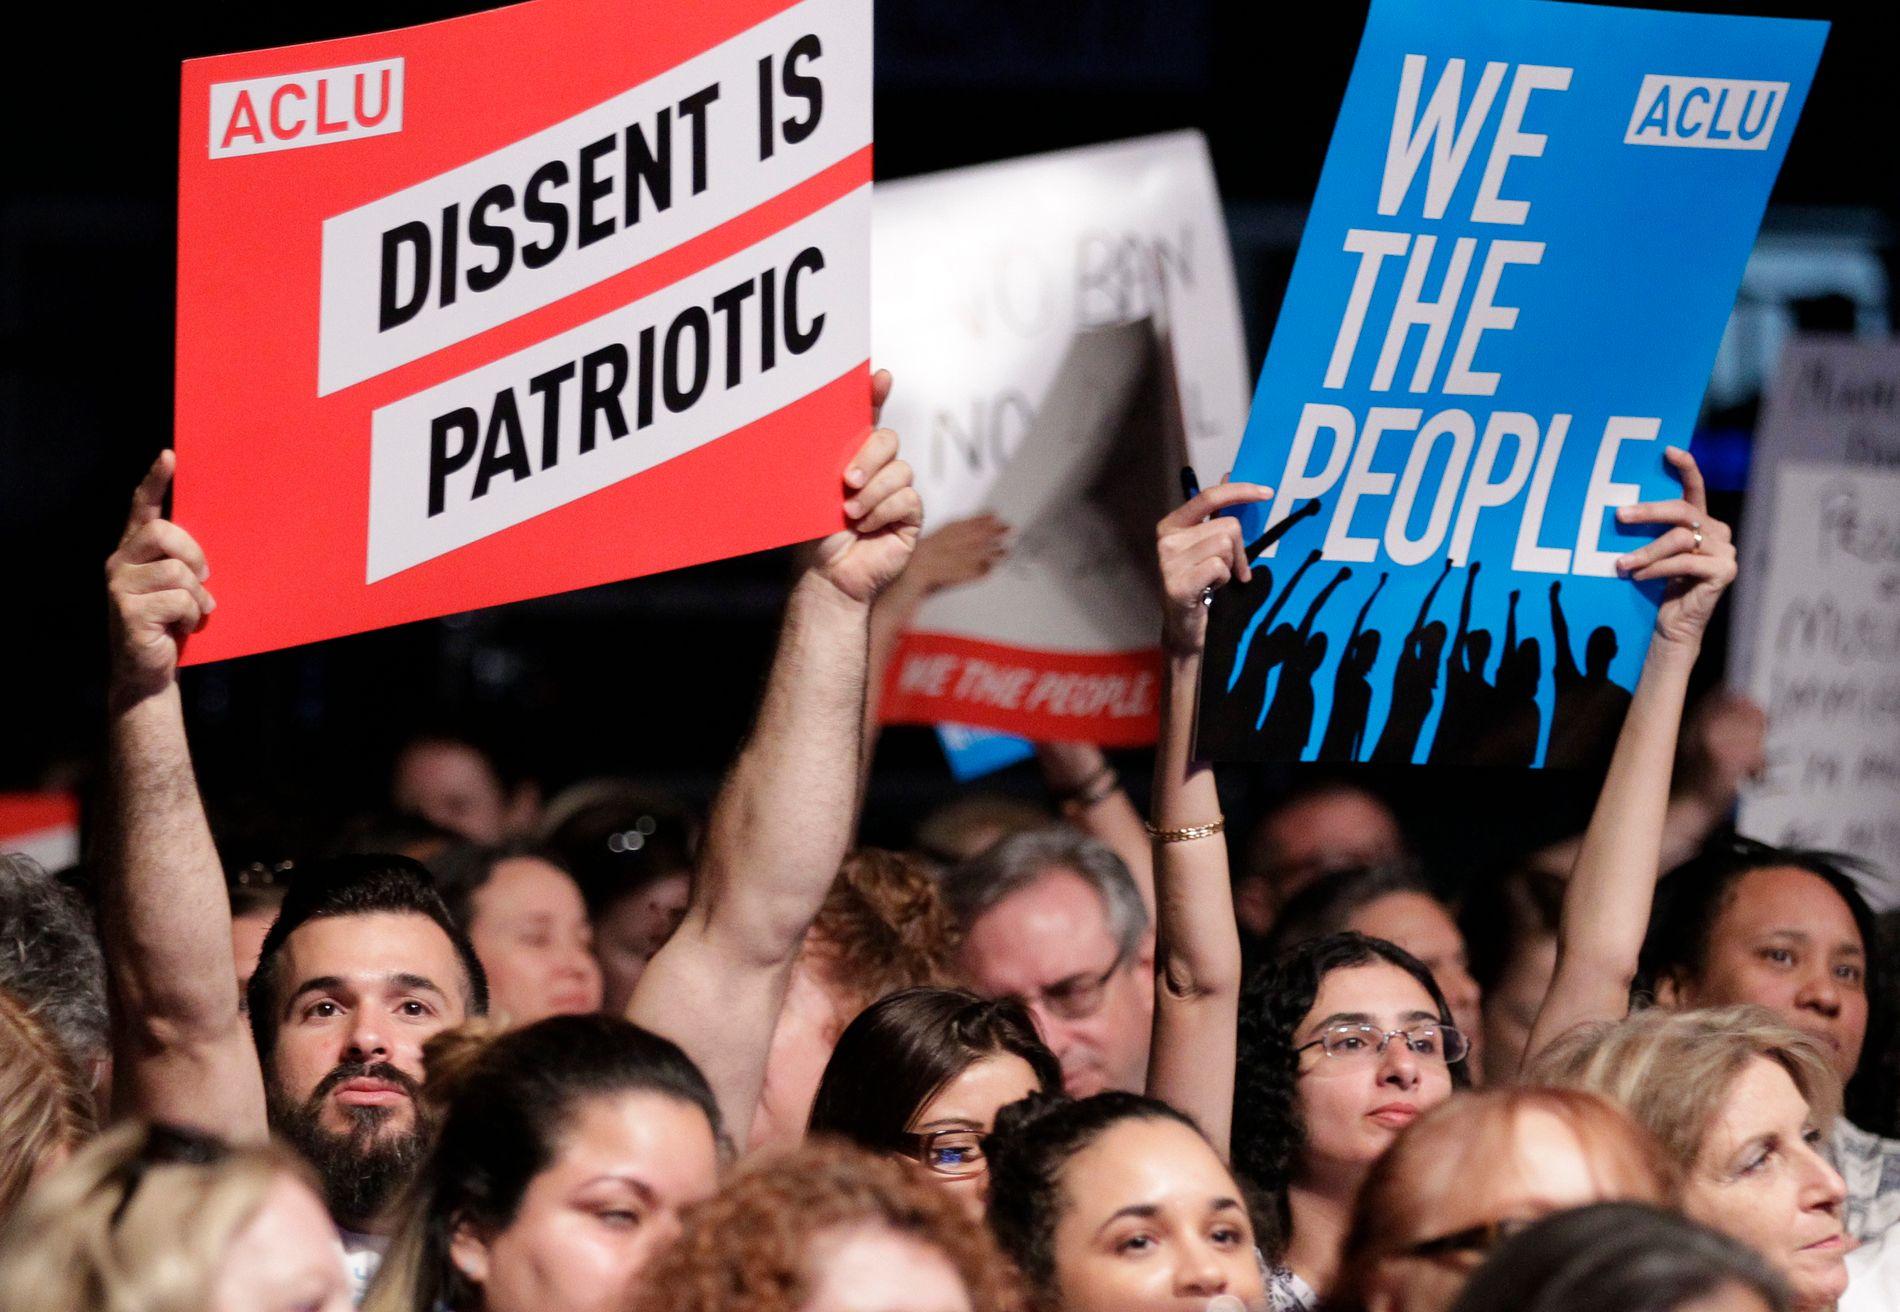 KANDIDAT: American Civil Liberties Union (ACLU), Den amerikanske borgerrettsunionen, er blant bookmakernes favoritter.